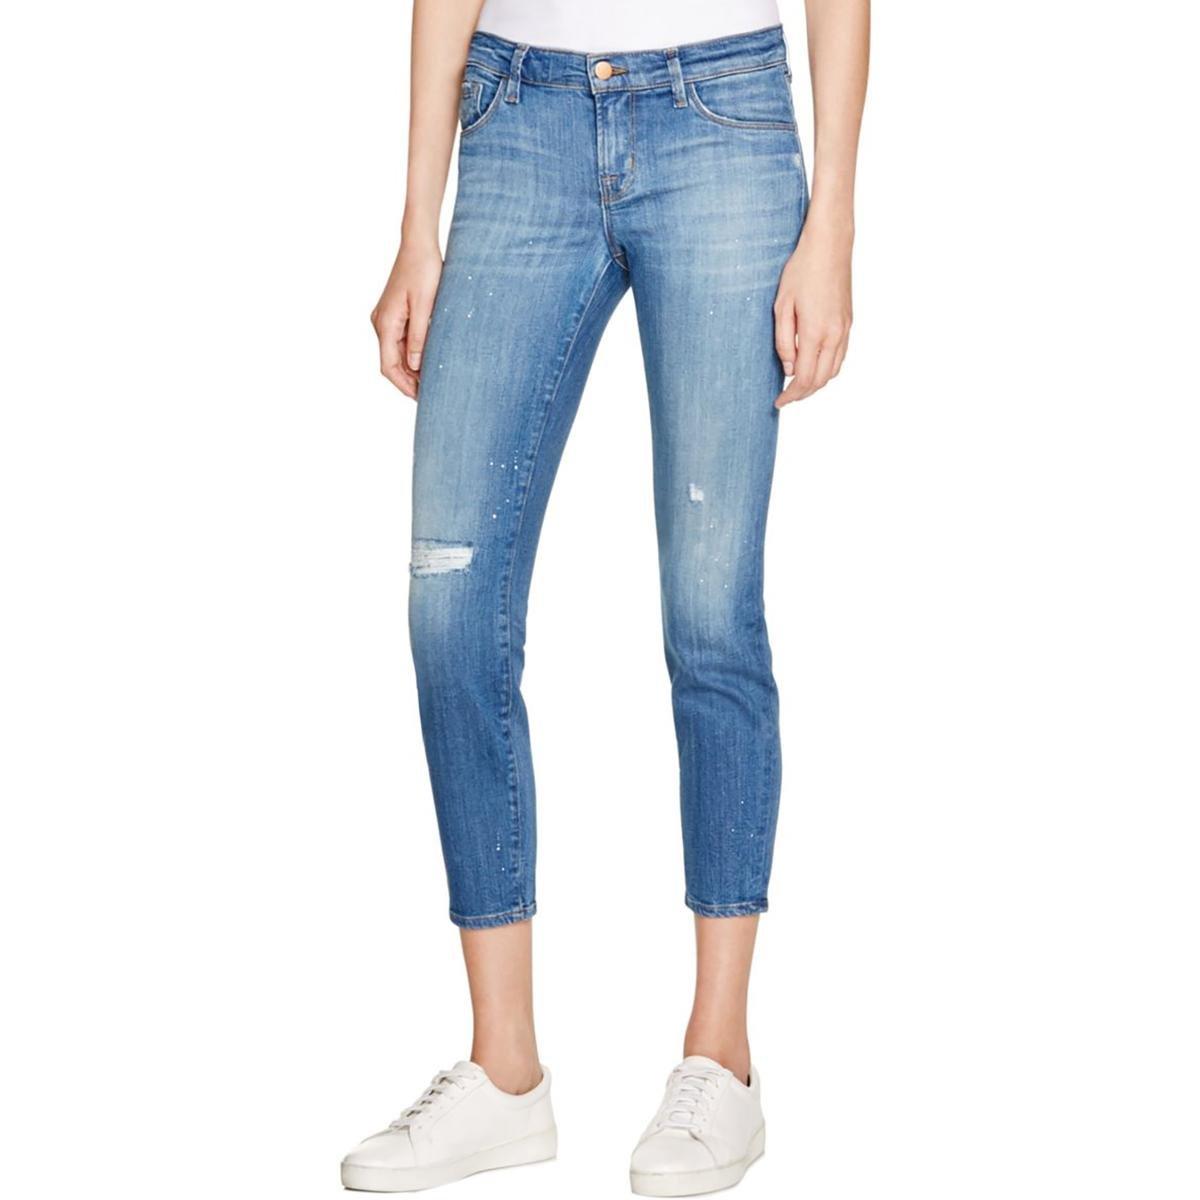 J Brand Jeans Women's 835 Mid-Rise Capri Collision Jeans (29, COLLISION) by J Brand Jeans